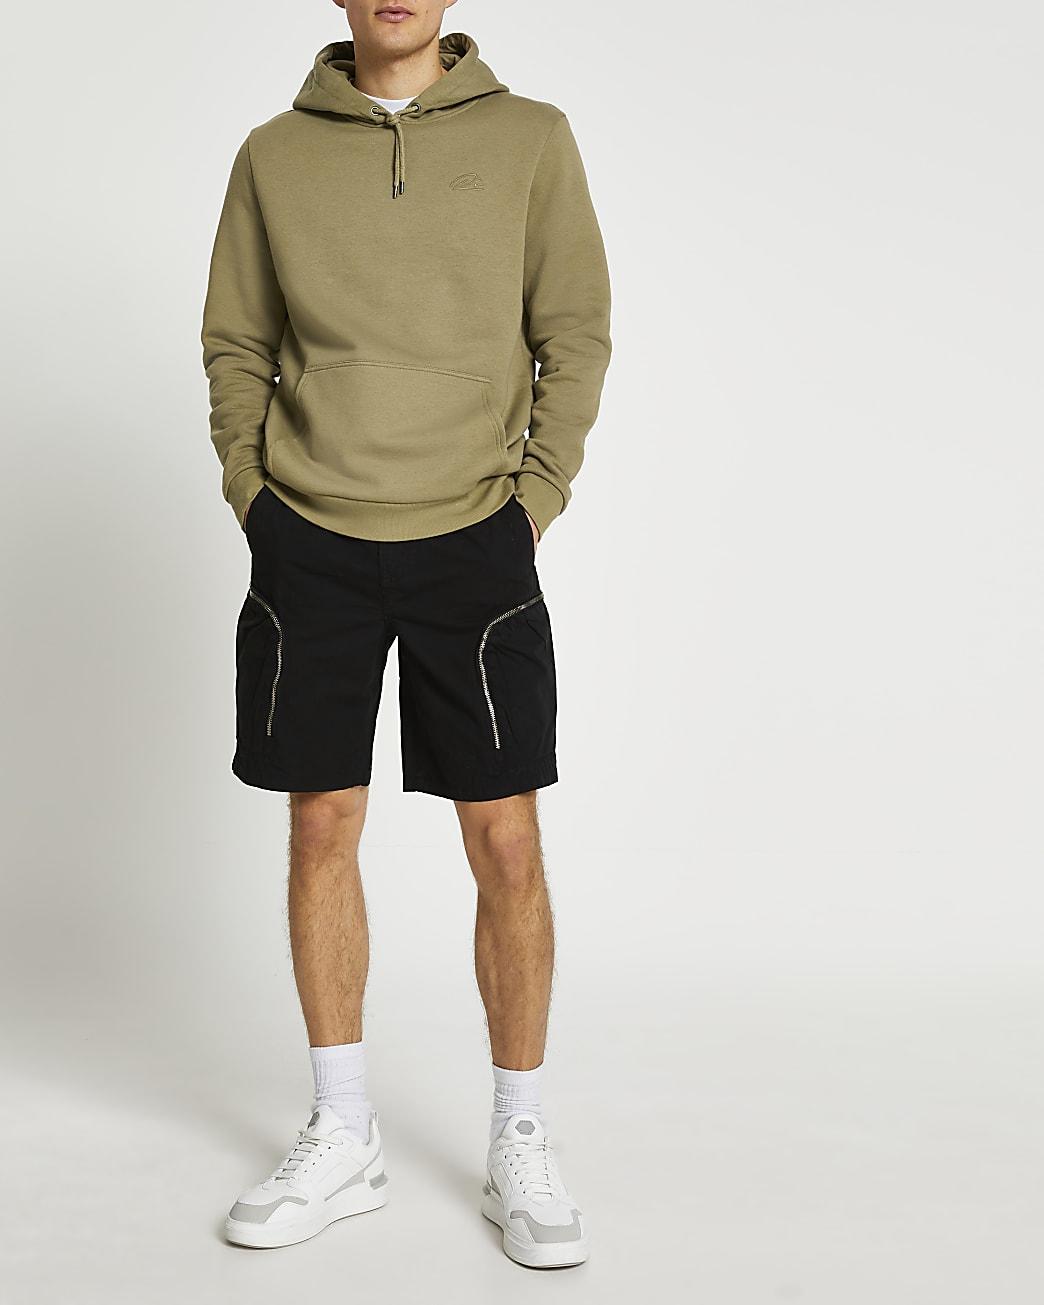 Black zip pocket cargo shorts